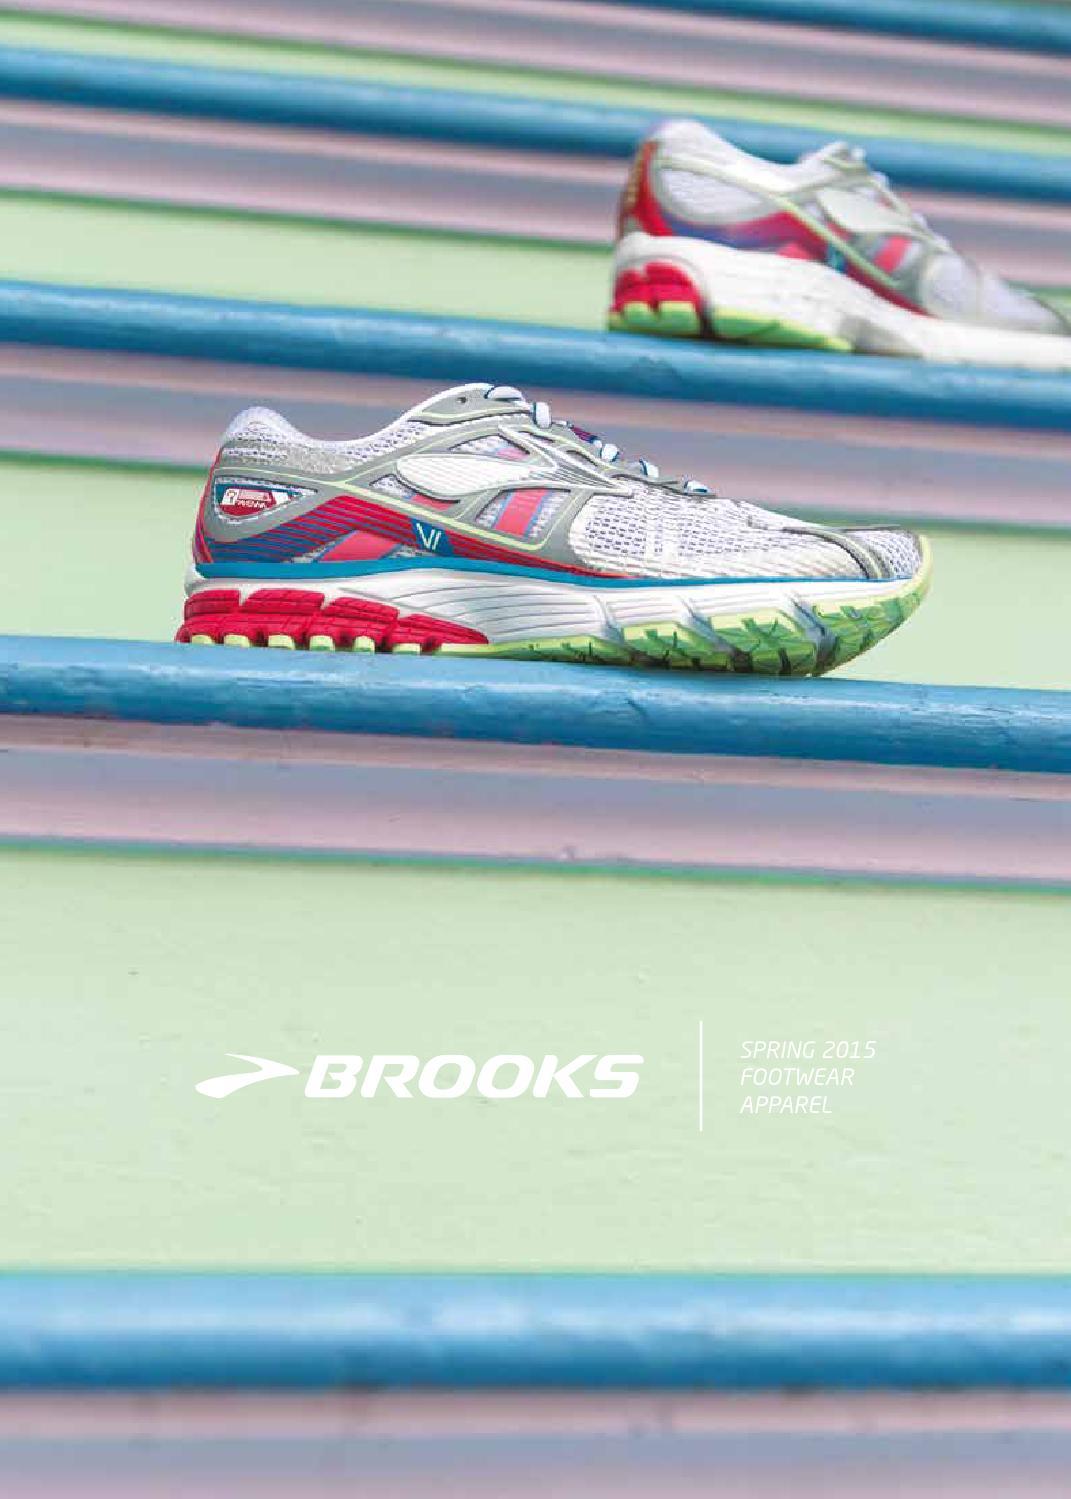 Brooks SS 15 Каталог Россия by Pro Athletics issuu